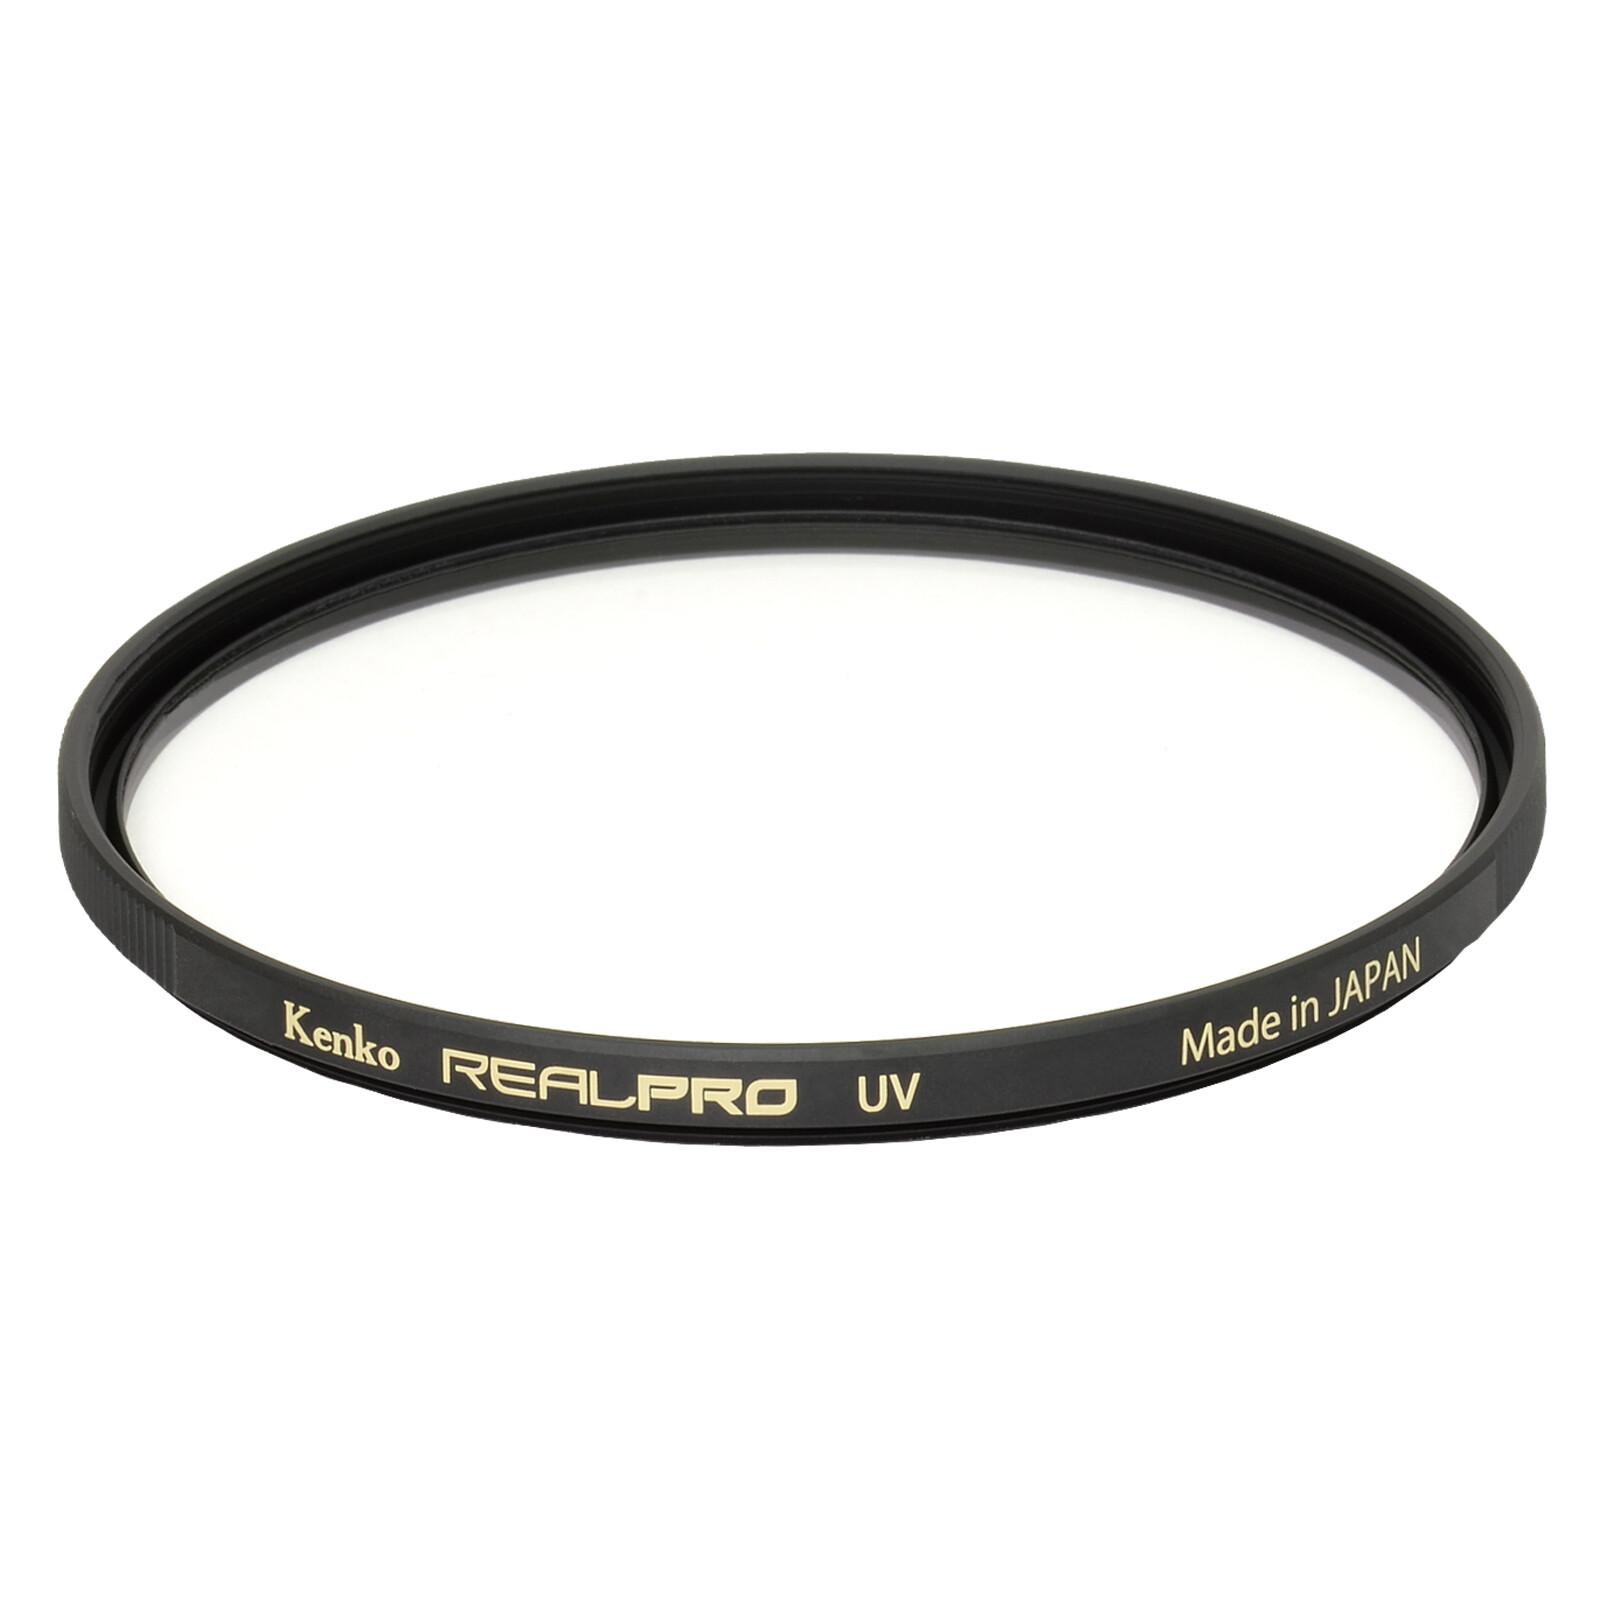 Kenko Real Pro UV 62mm Slim